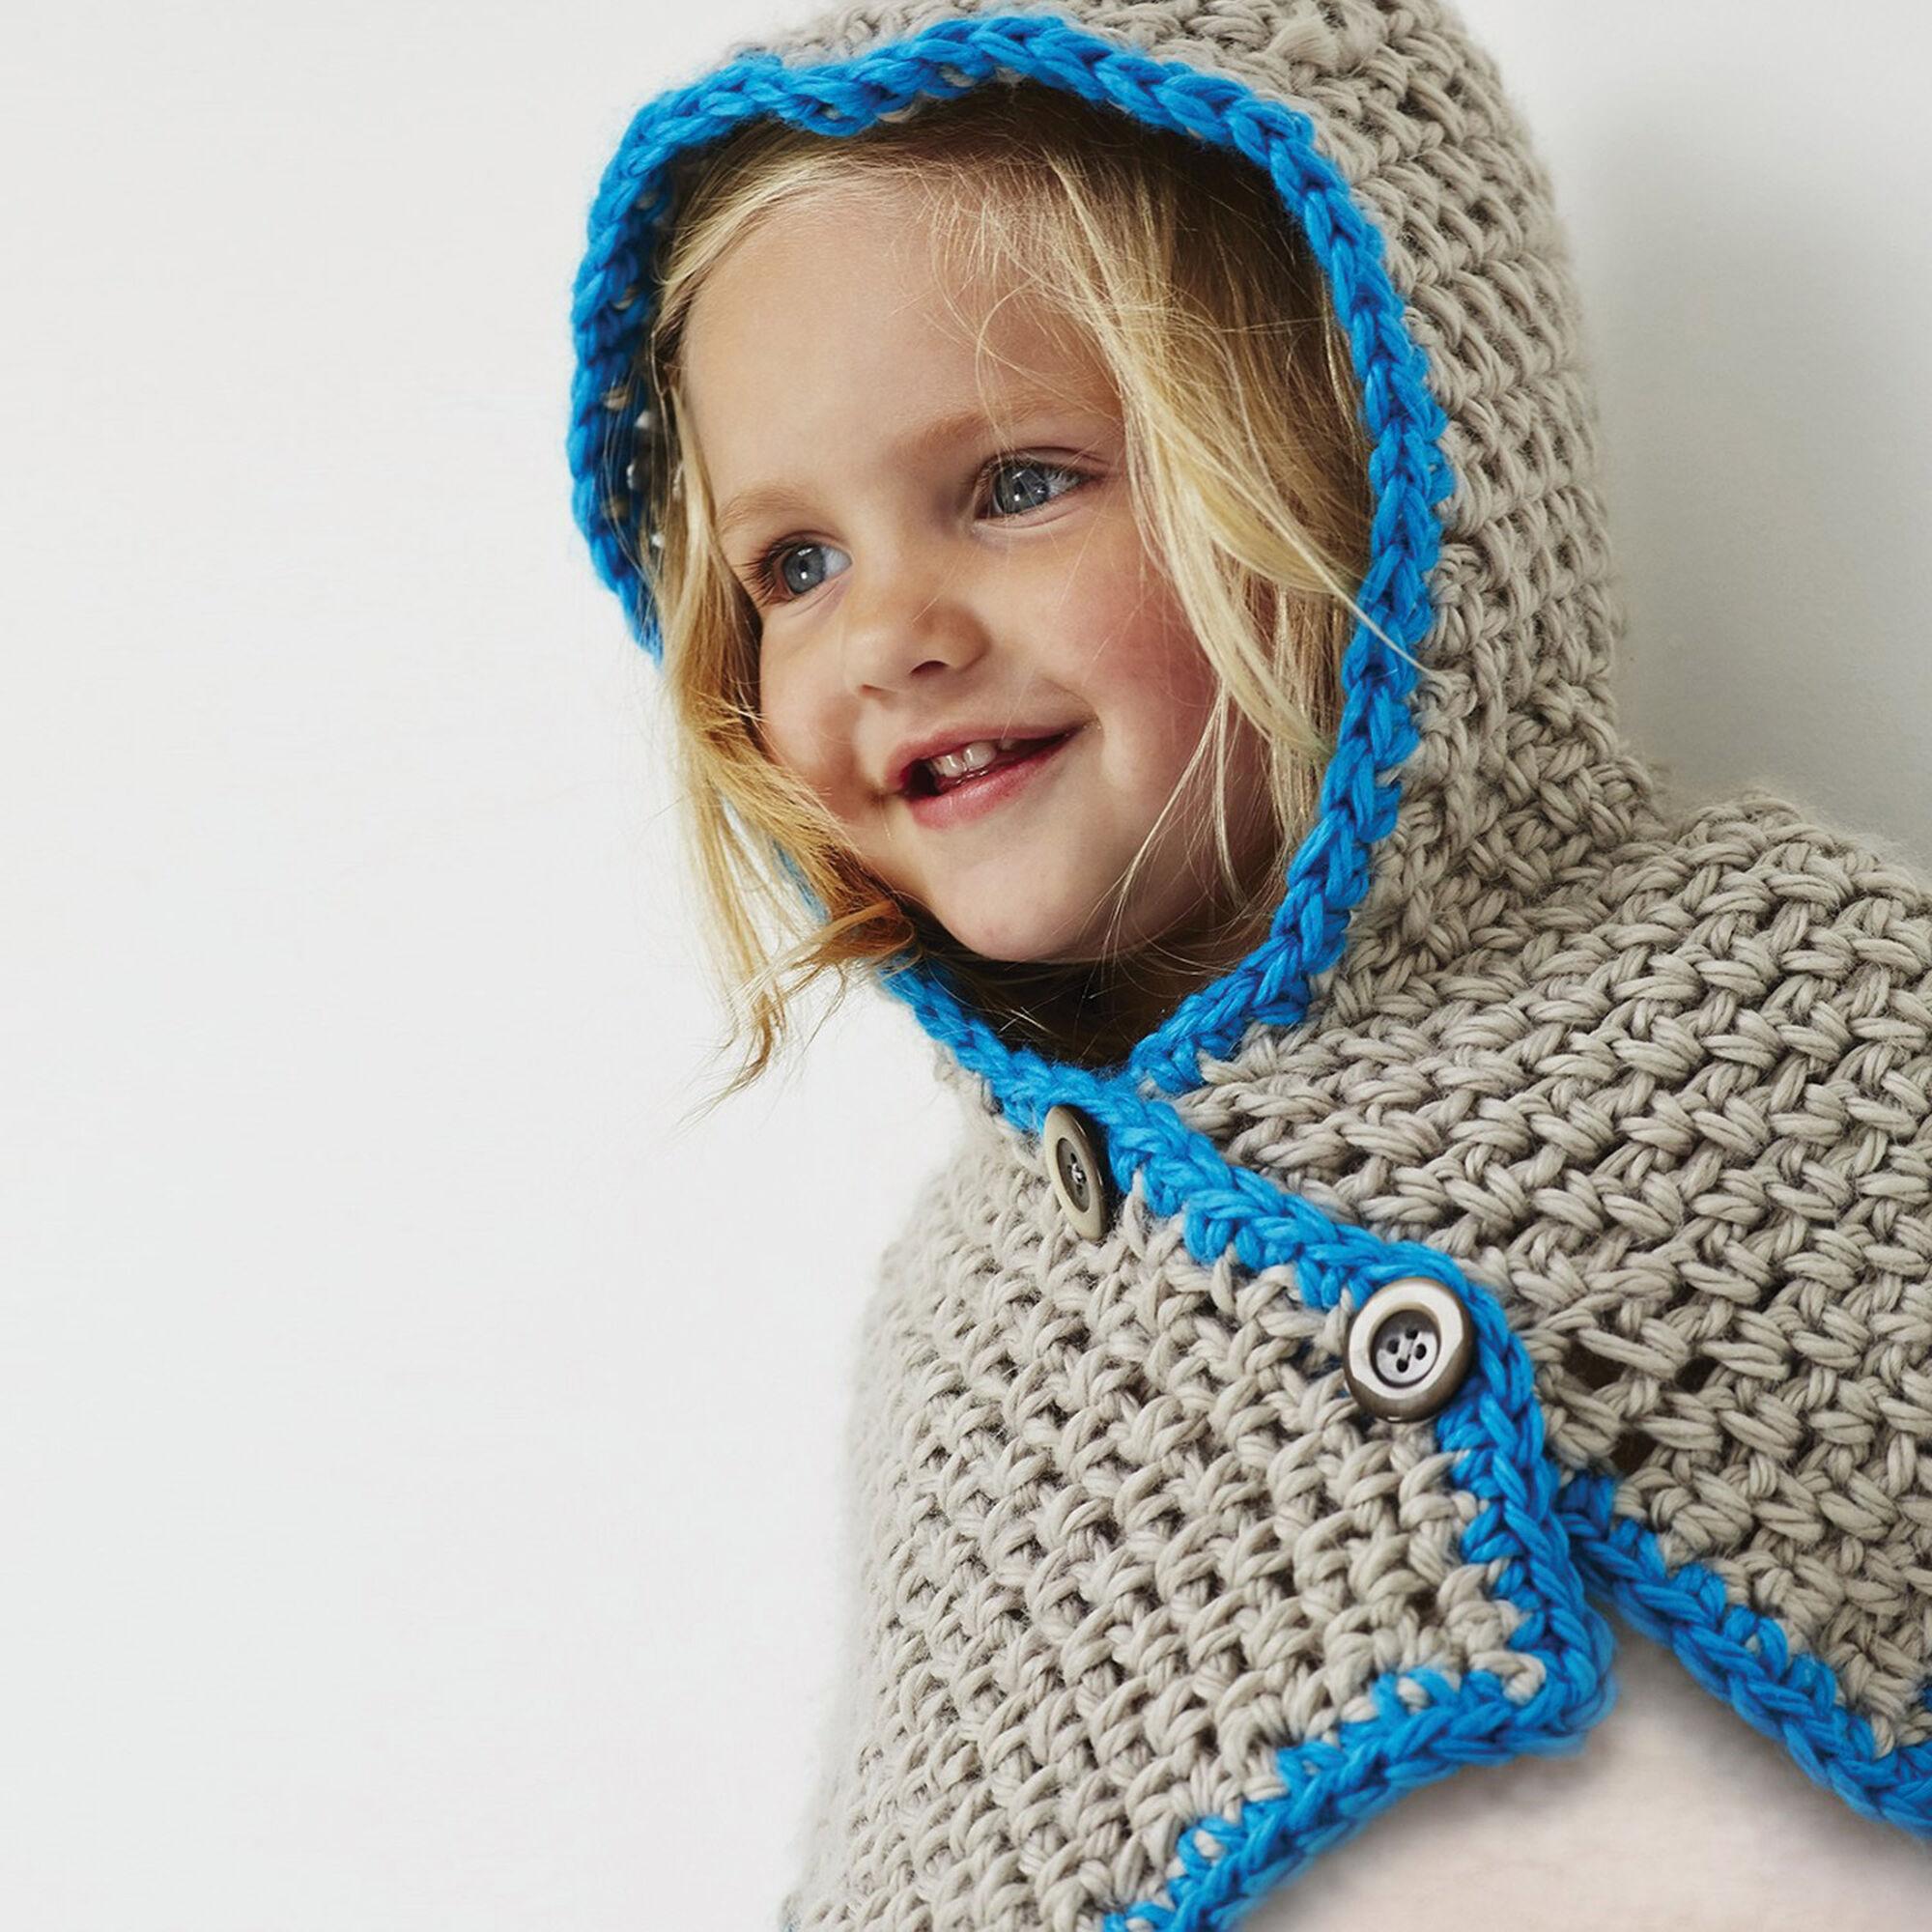 Bernat Hooded Cowl, 6-12 months | Yarnspirations